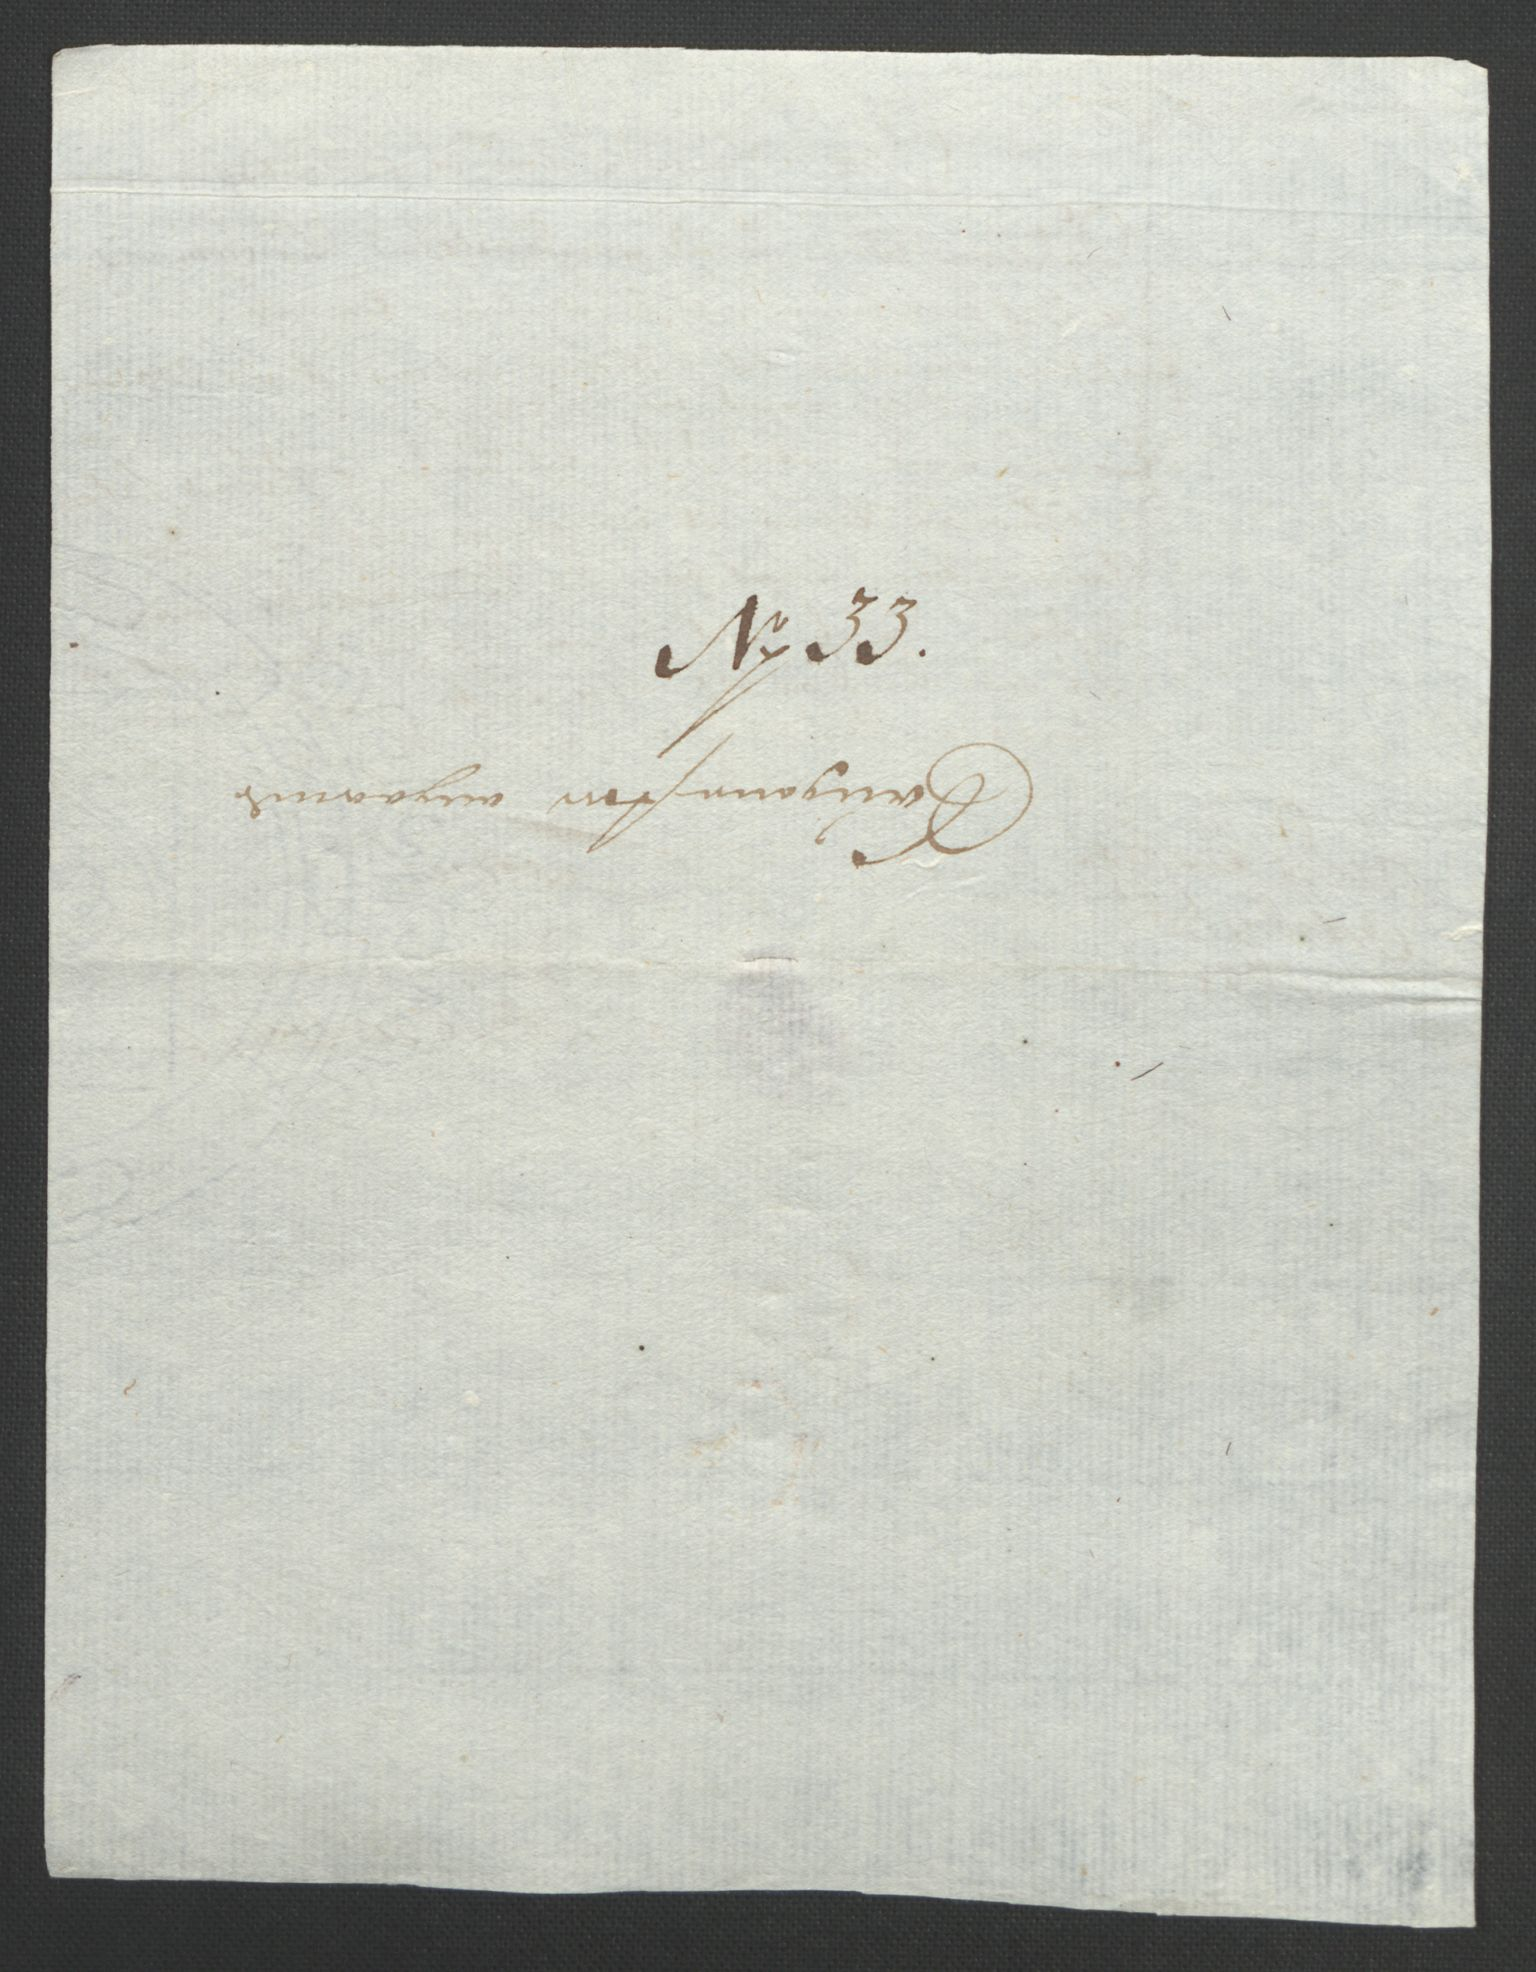 RA, Rentekammeret inntil 1814, Reviderte regnskaper, Fogderegnskap, R32/L1864: Fogderegnskap Jarlsberg grevskap, 1691, s. 232